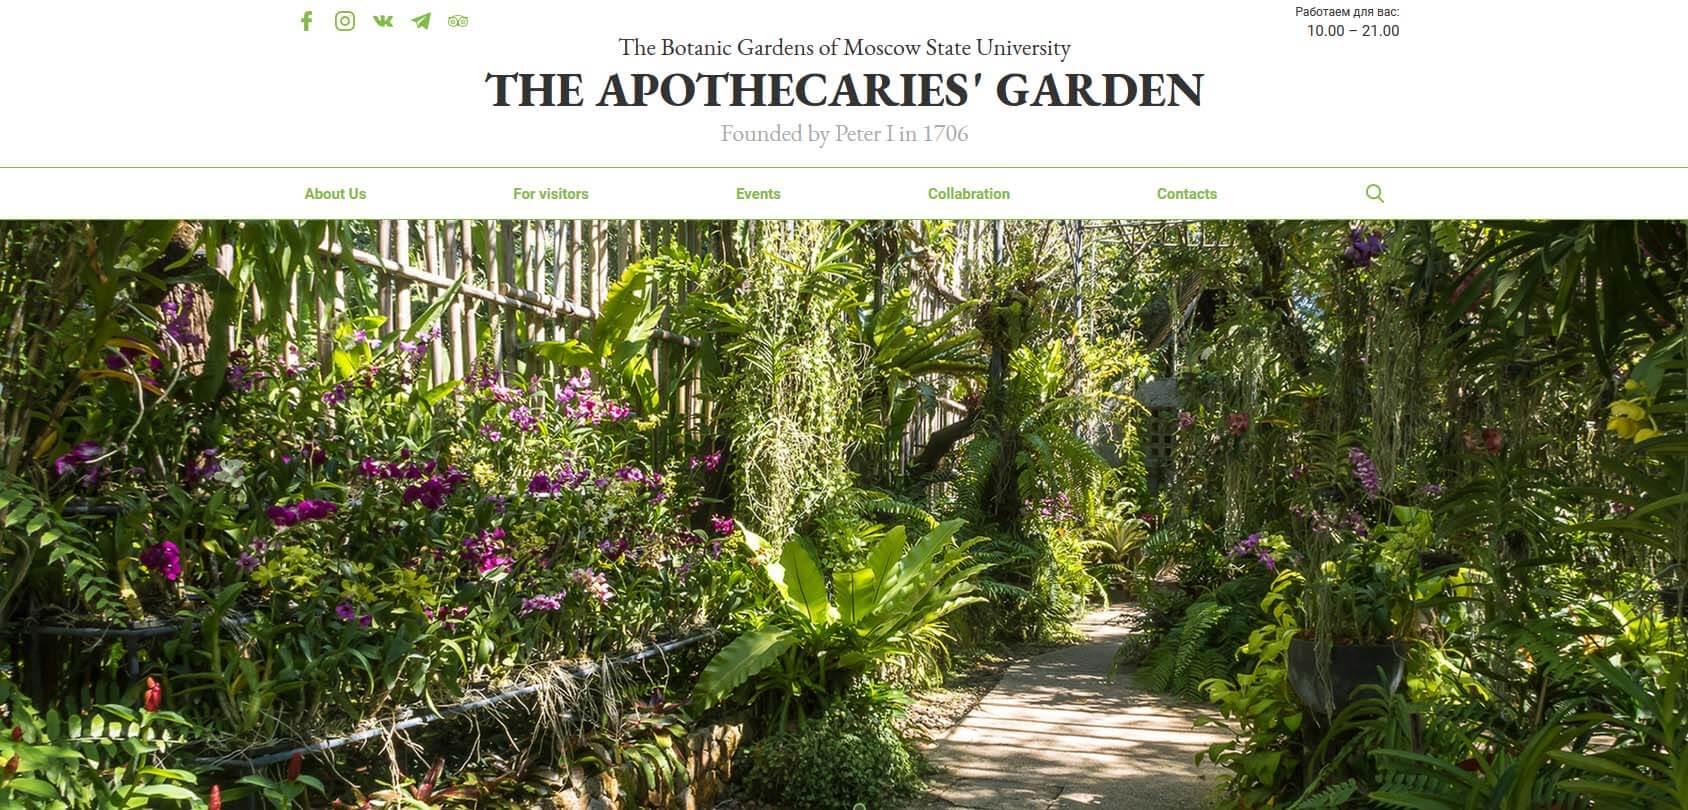 The Apothecaries' Garden Homepage